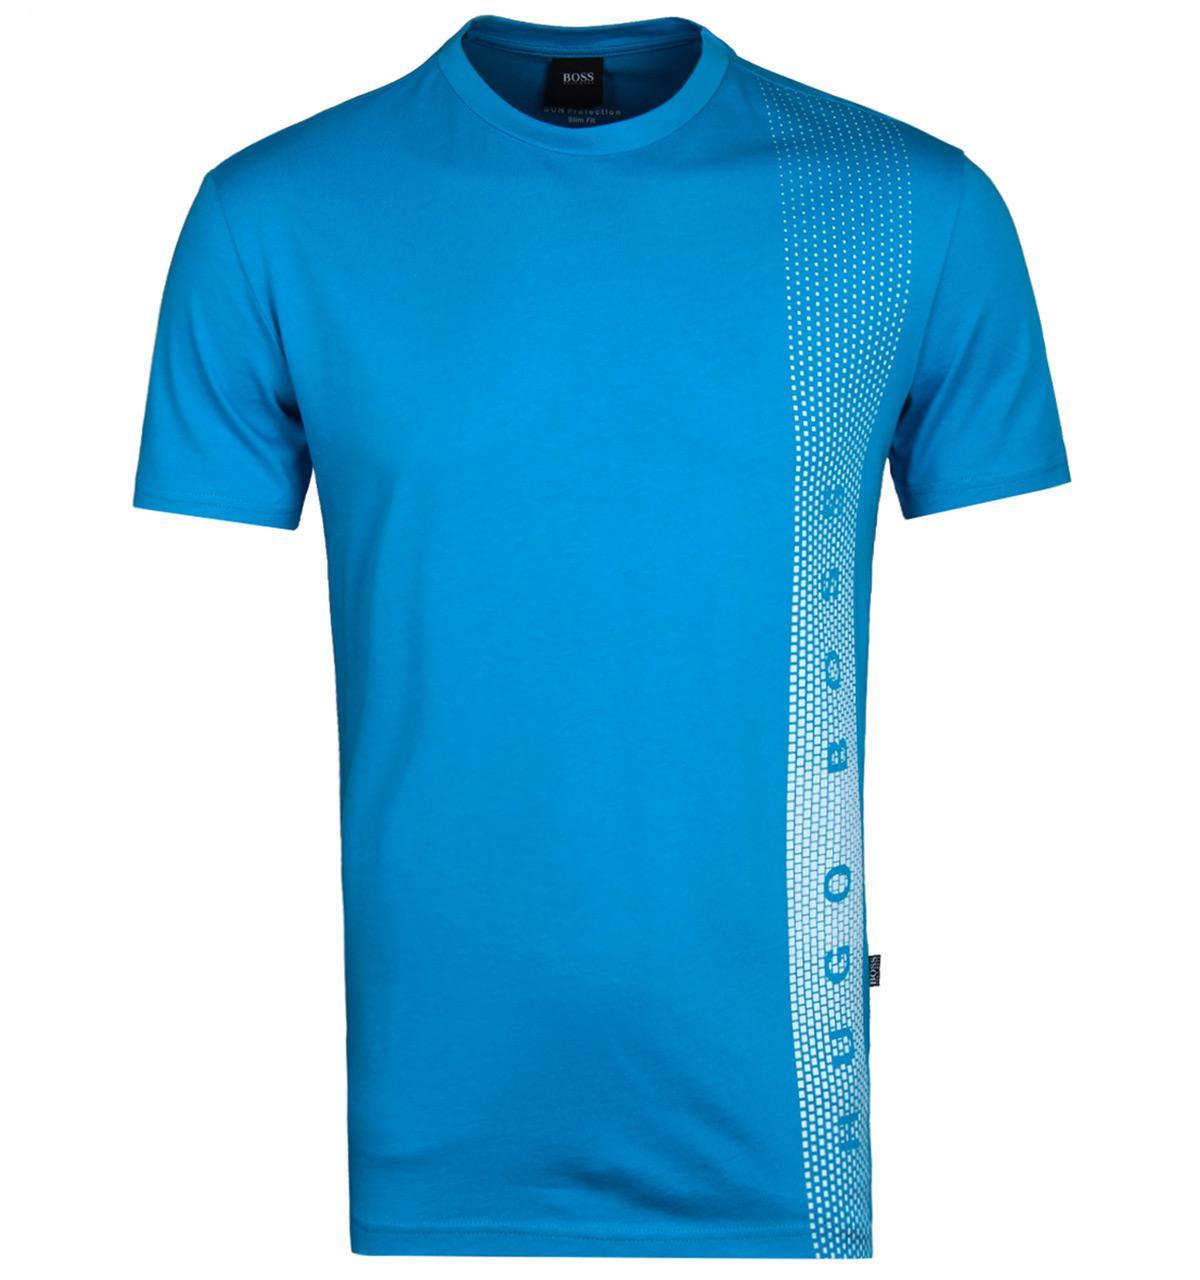 Boss rn sun protection aqua blue white jersey slim fit t for Aqua blue mens dress shirt